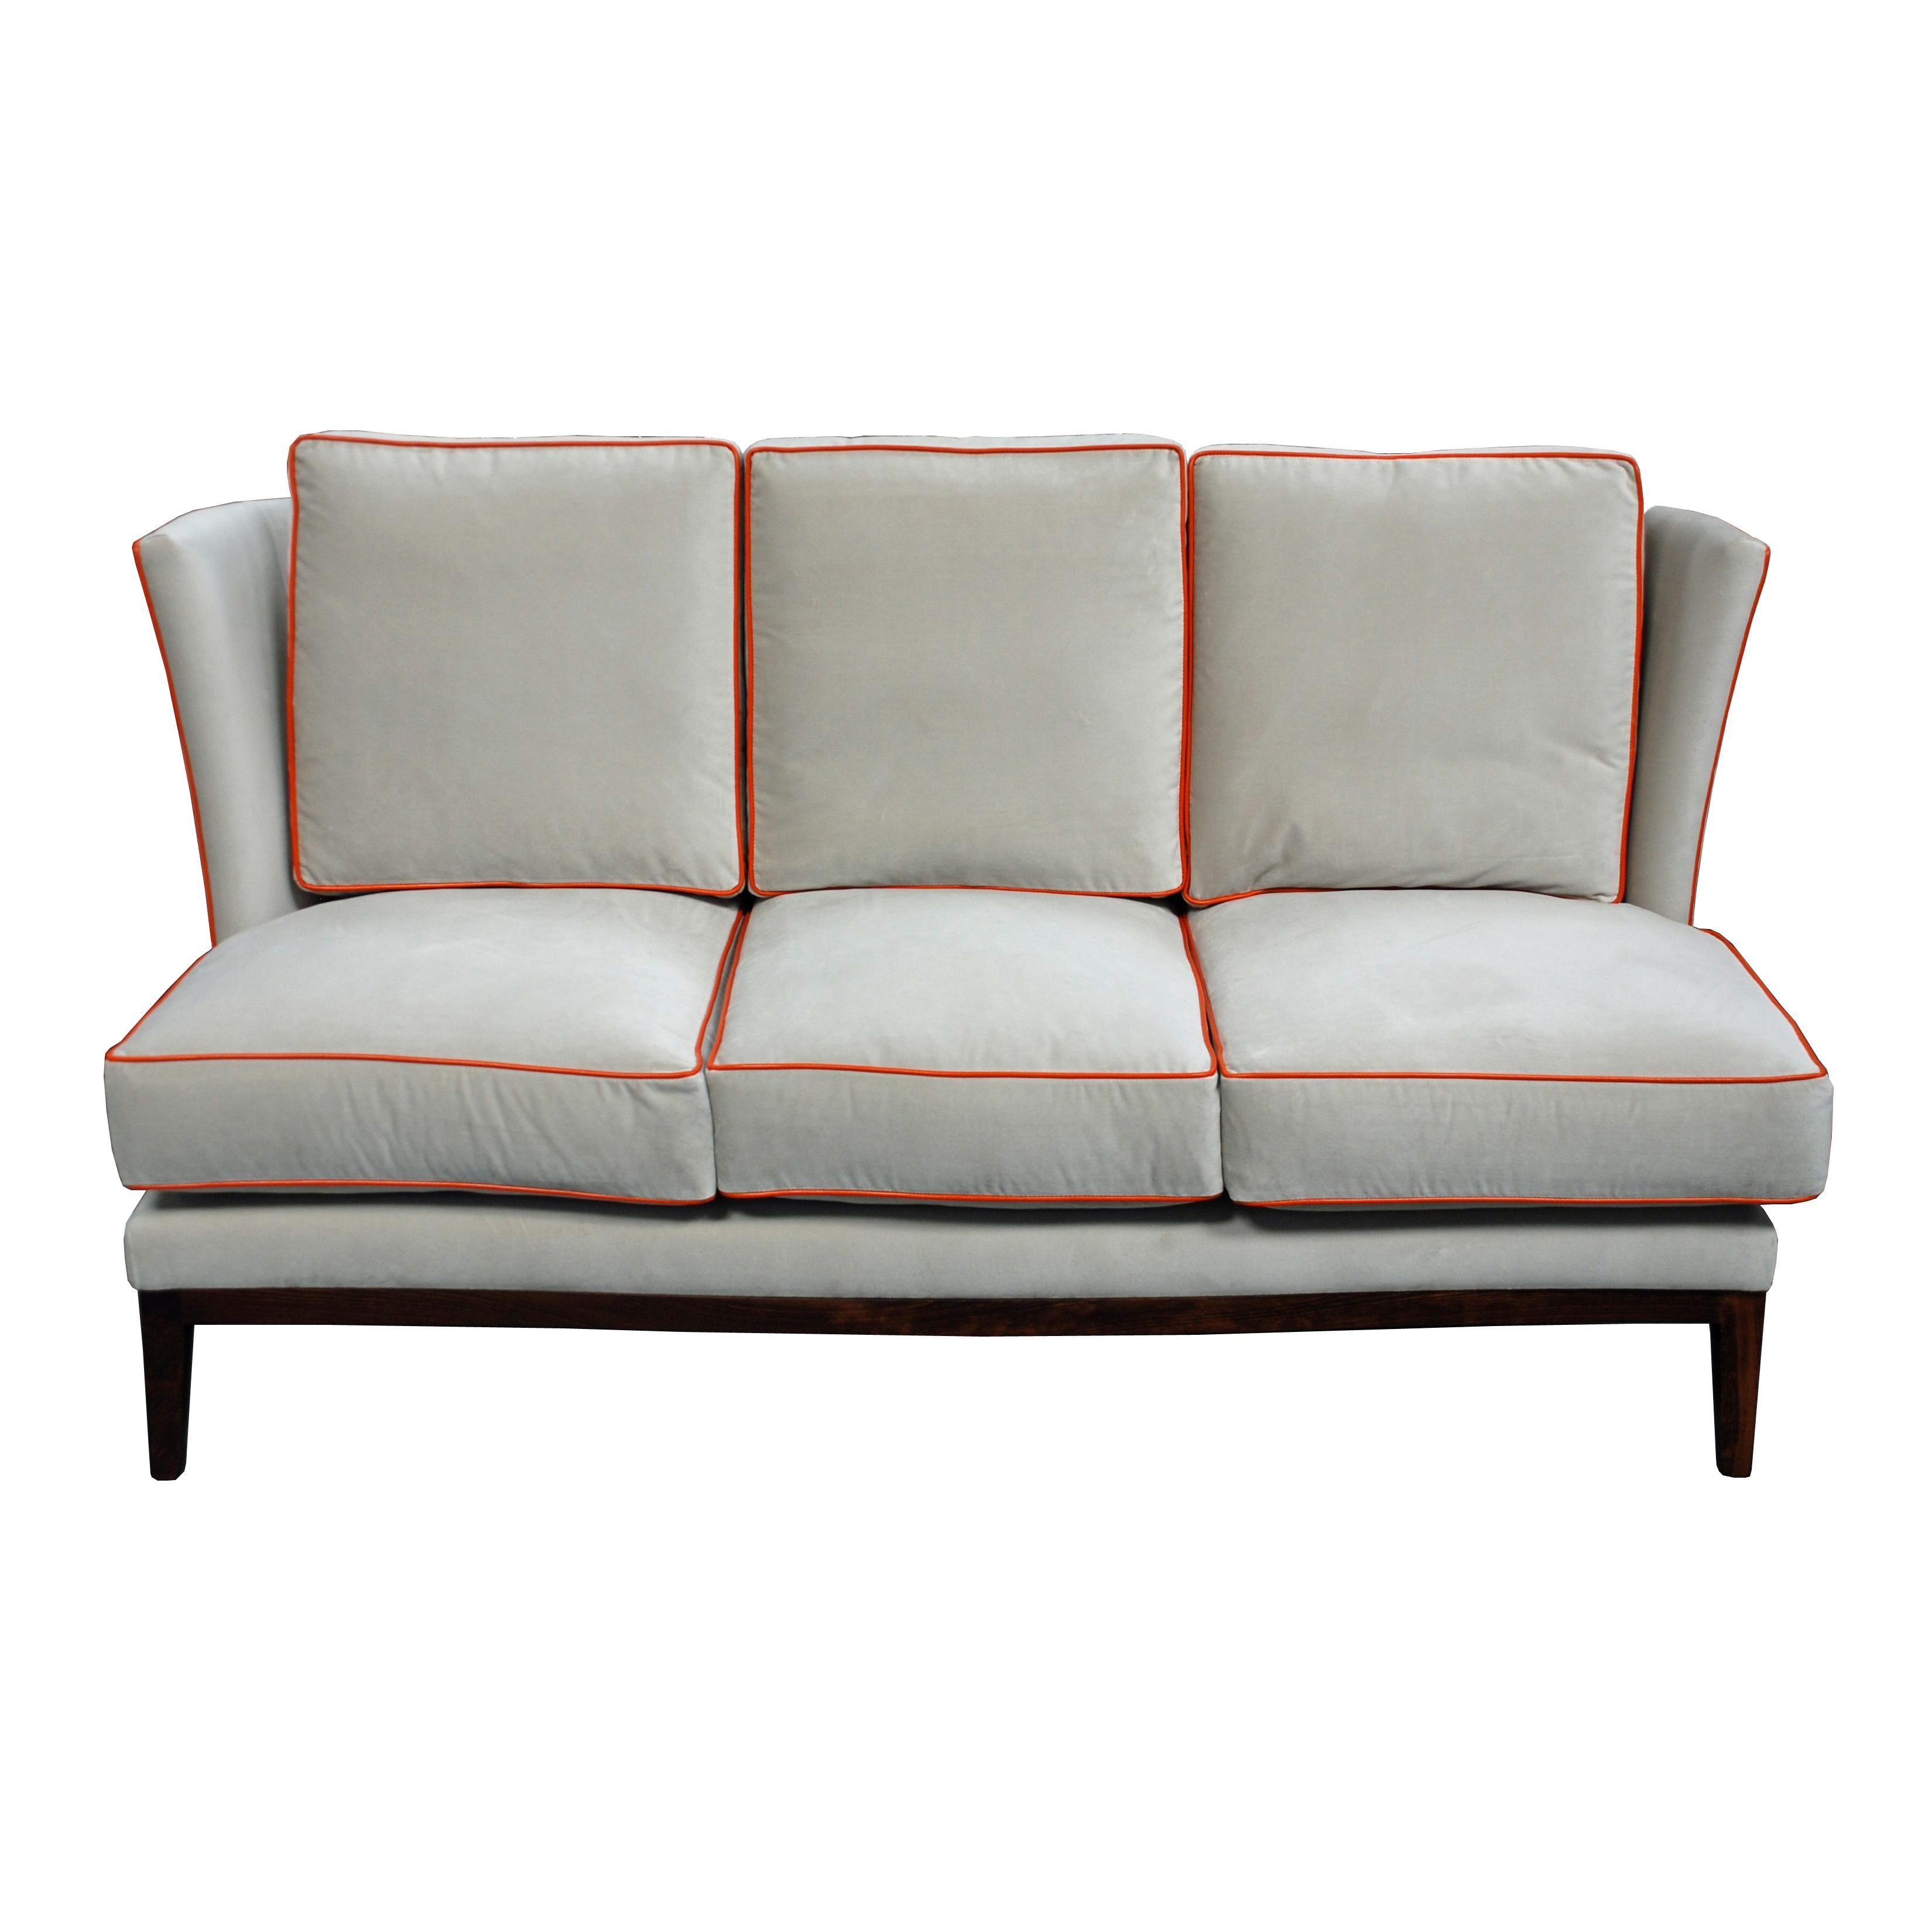 Putney Sofa Handmade in UK Chairmaker : Putney sofa SQ from www.chairmaker.co.uk size 3300 x 3300 jpeg 2455kB